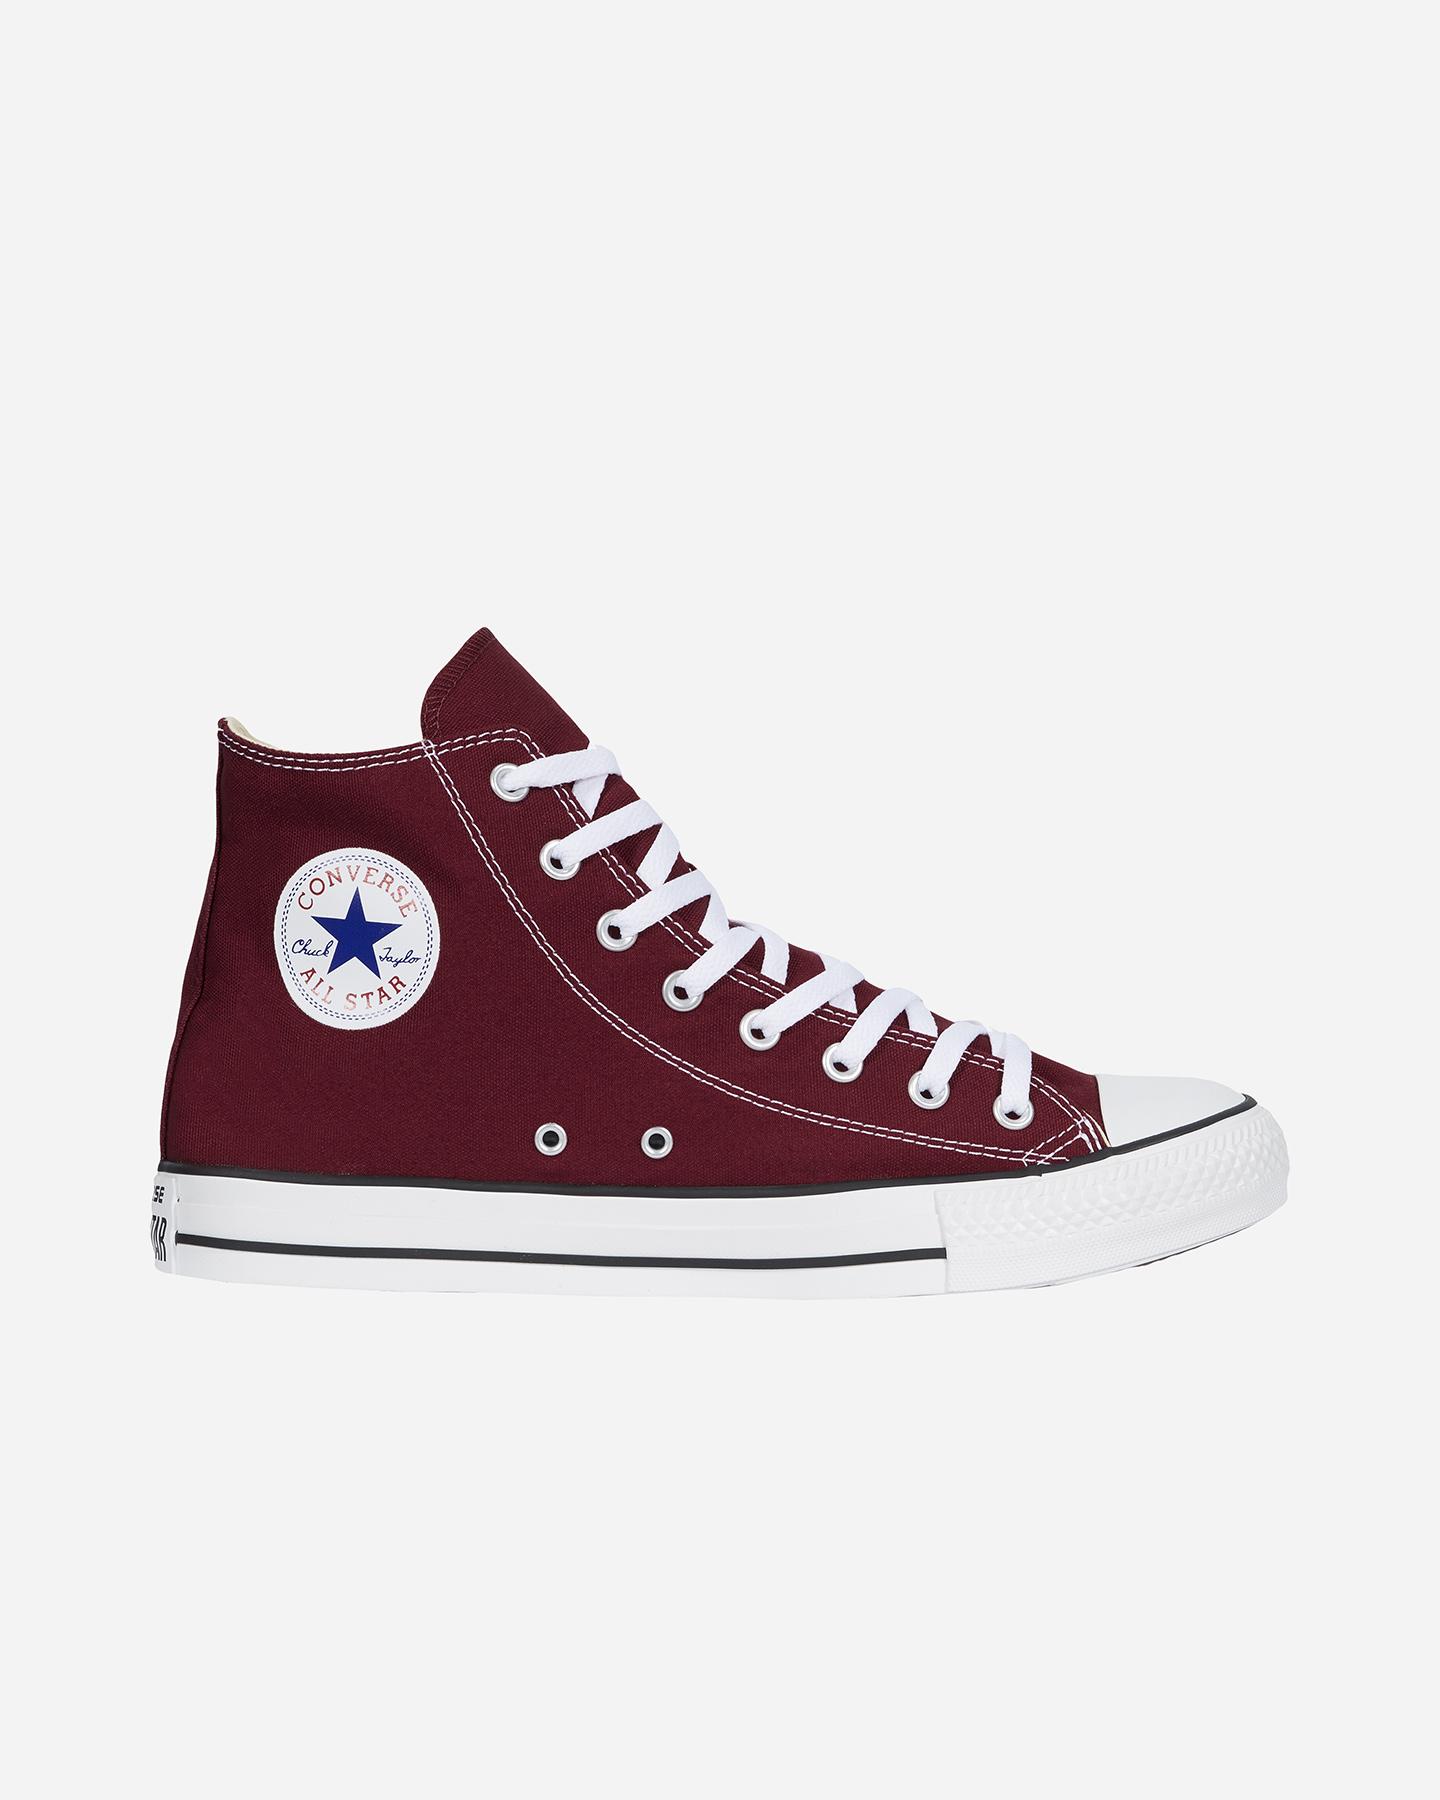 Scarpe Sneakers Converse Chuck Taylor All Star Hi M X/M7650C ...